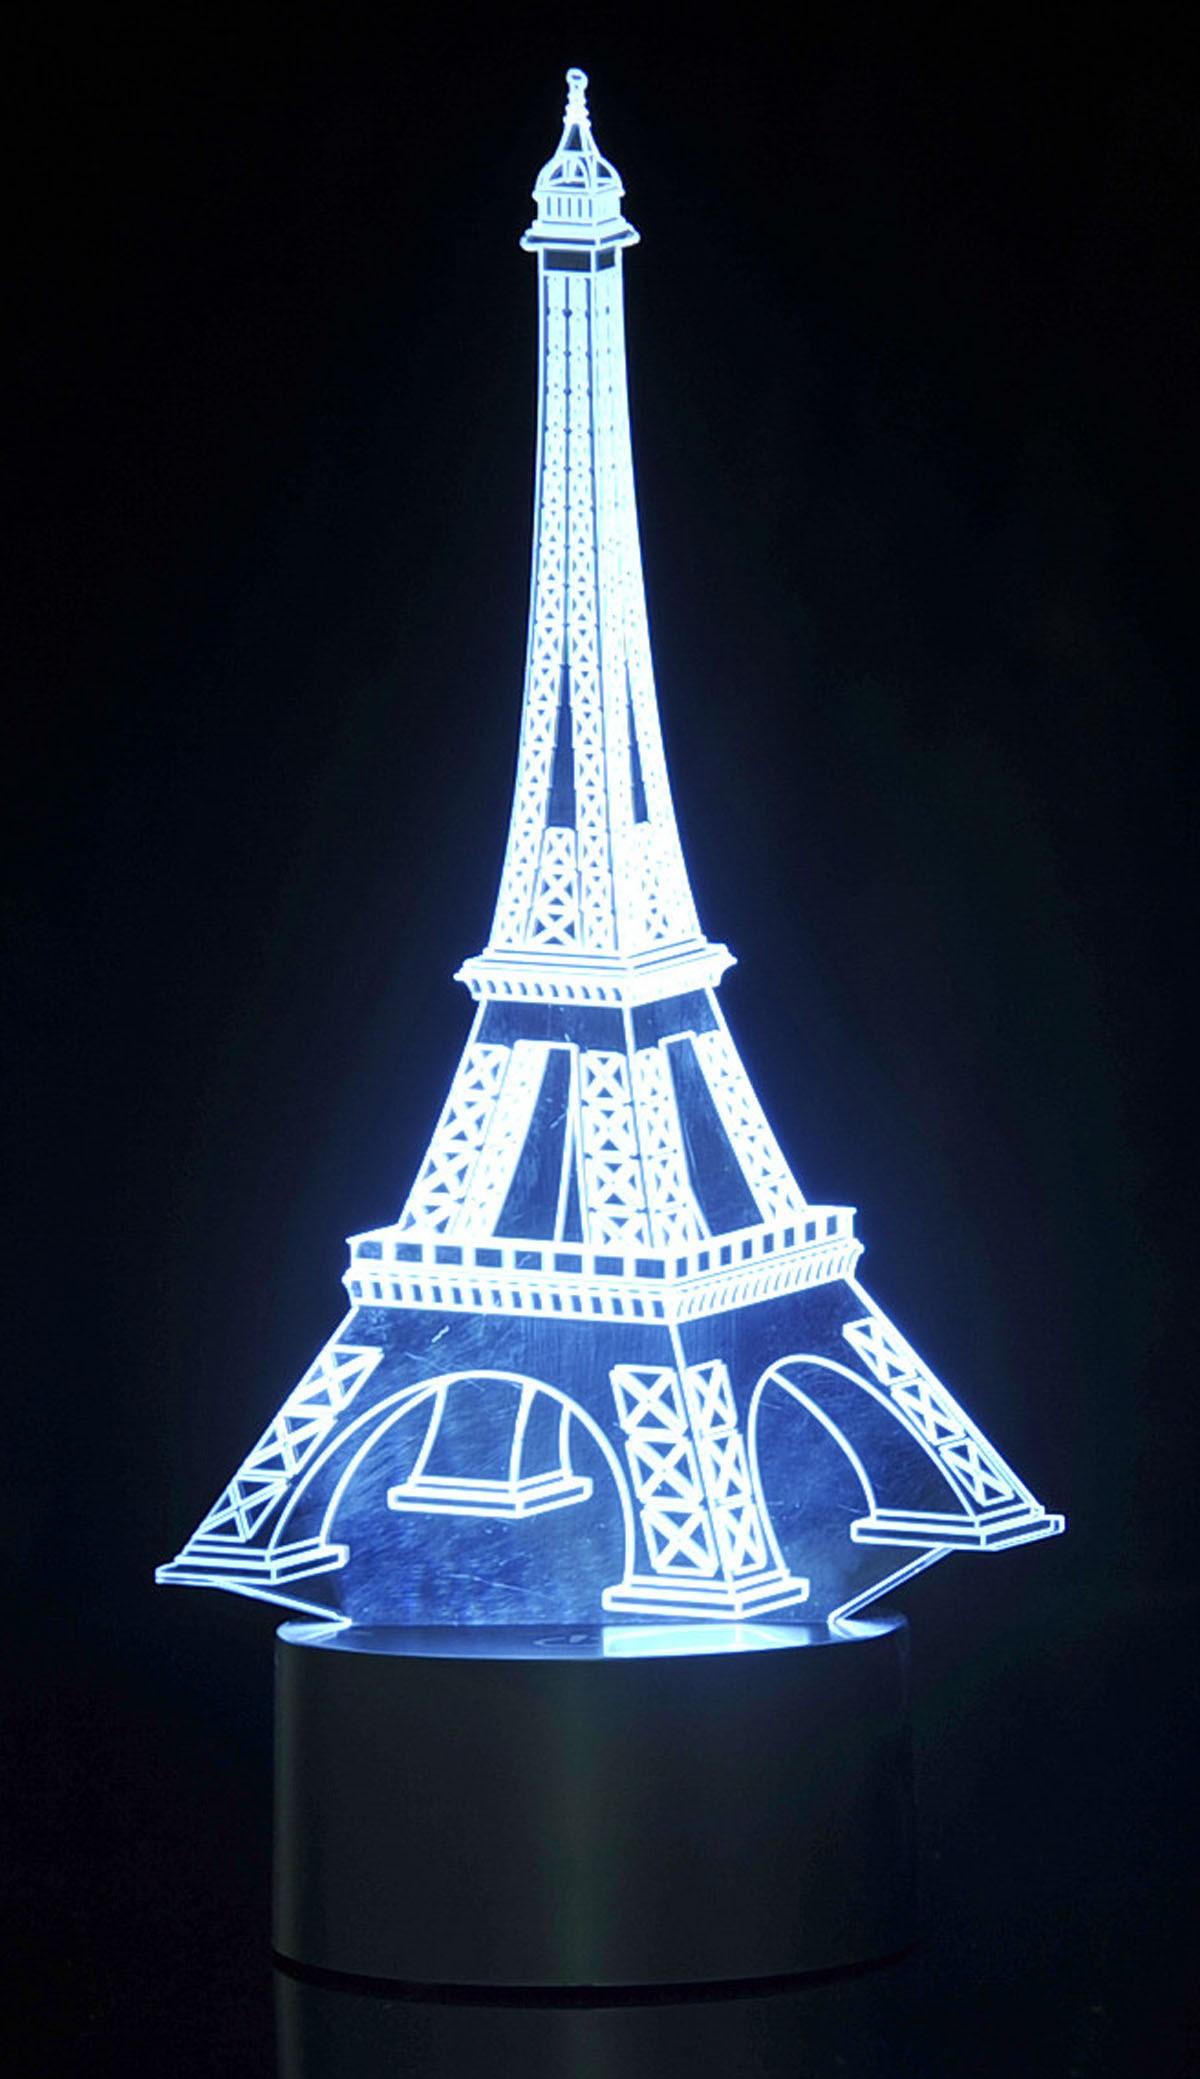 3D Eifel Tower Laser Cut Precision LED Lights